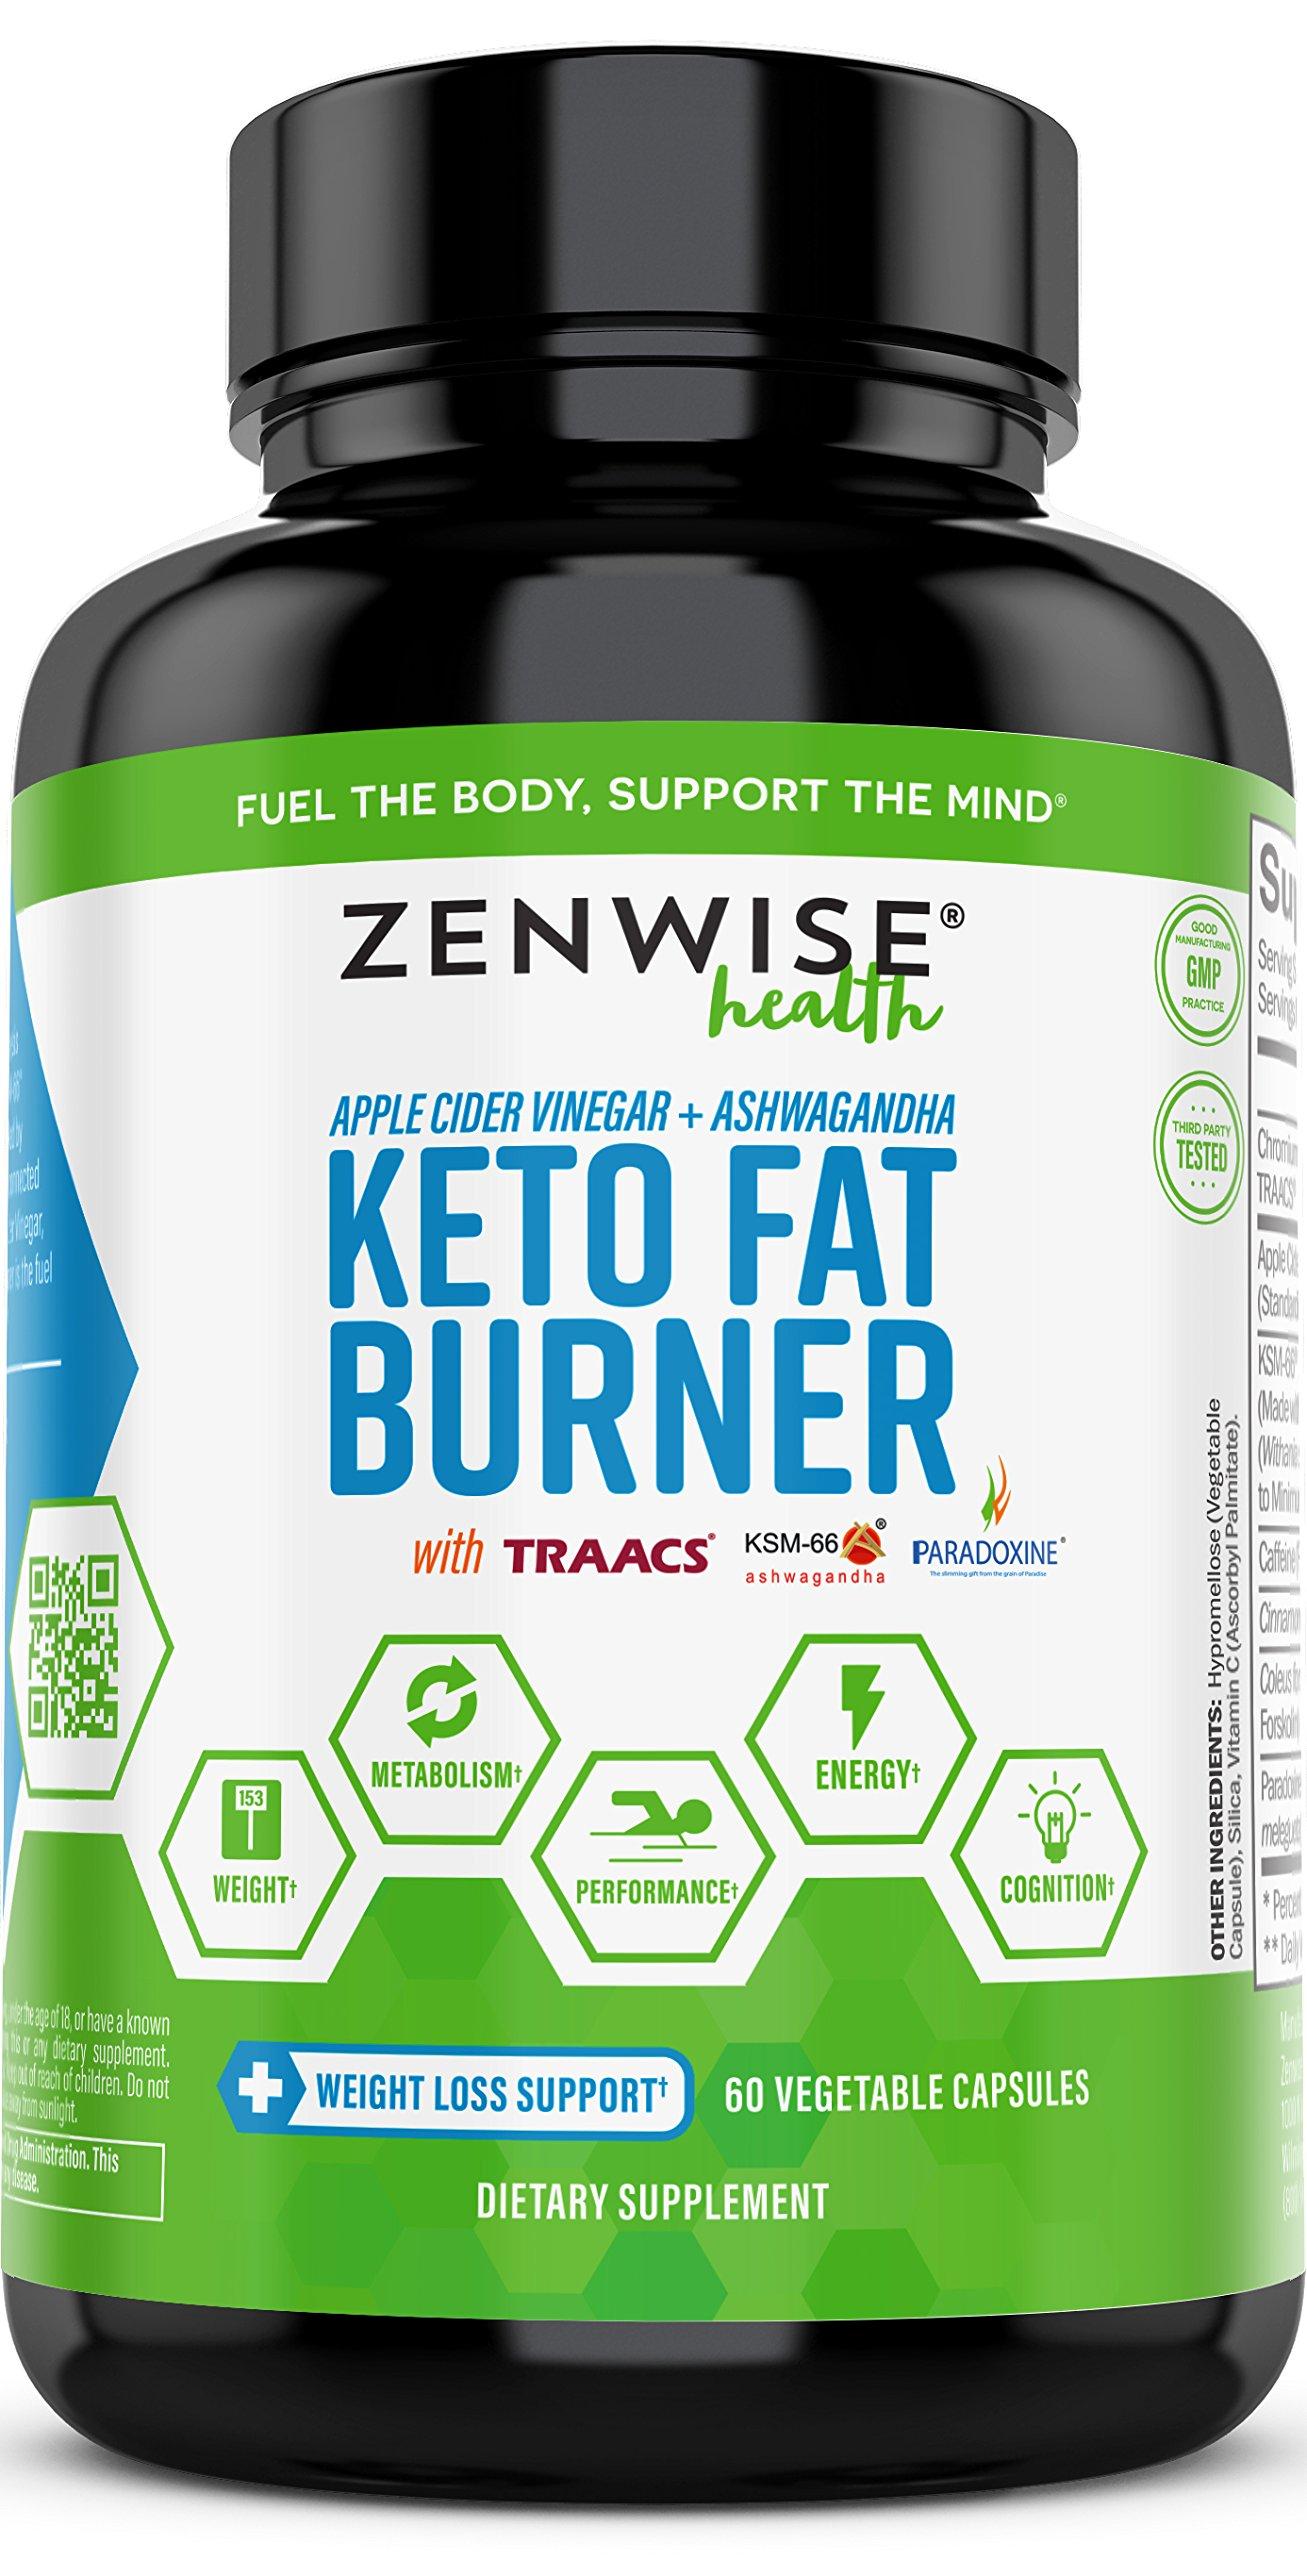 Keto Fat Burner - Ketogenic Diet Pills with Apple Cider Vinegar, Ashwagandha, Forskolin & Caffeine - Thermogenic Fat Burners + Metabolism & Energy Supplement - 60 Capsules by Zenwise Health